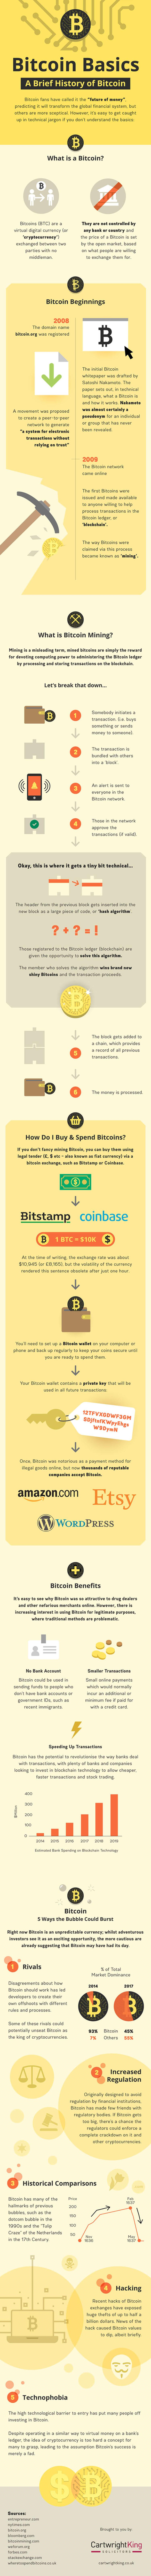 A Brief History of Bitcoin